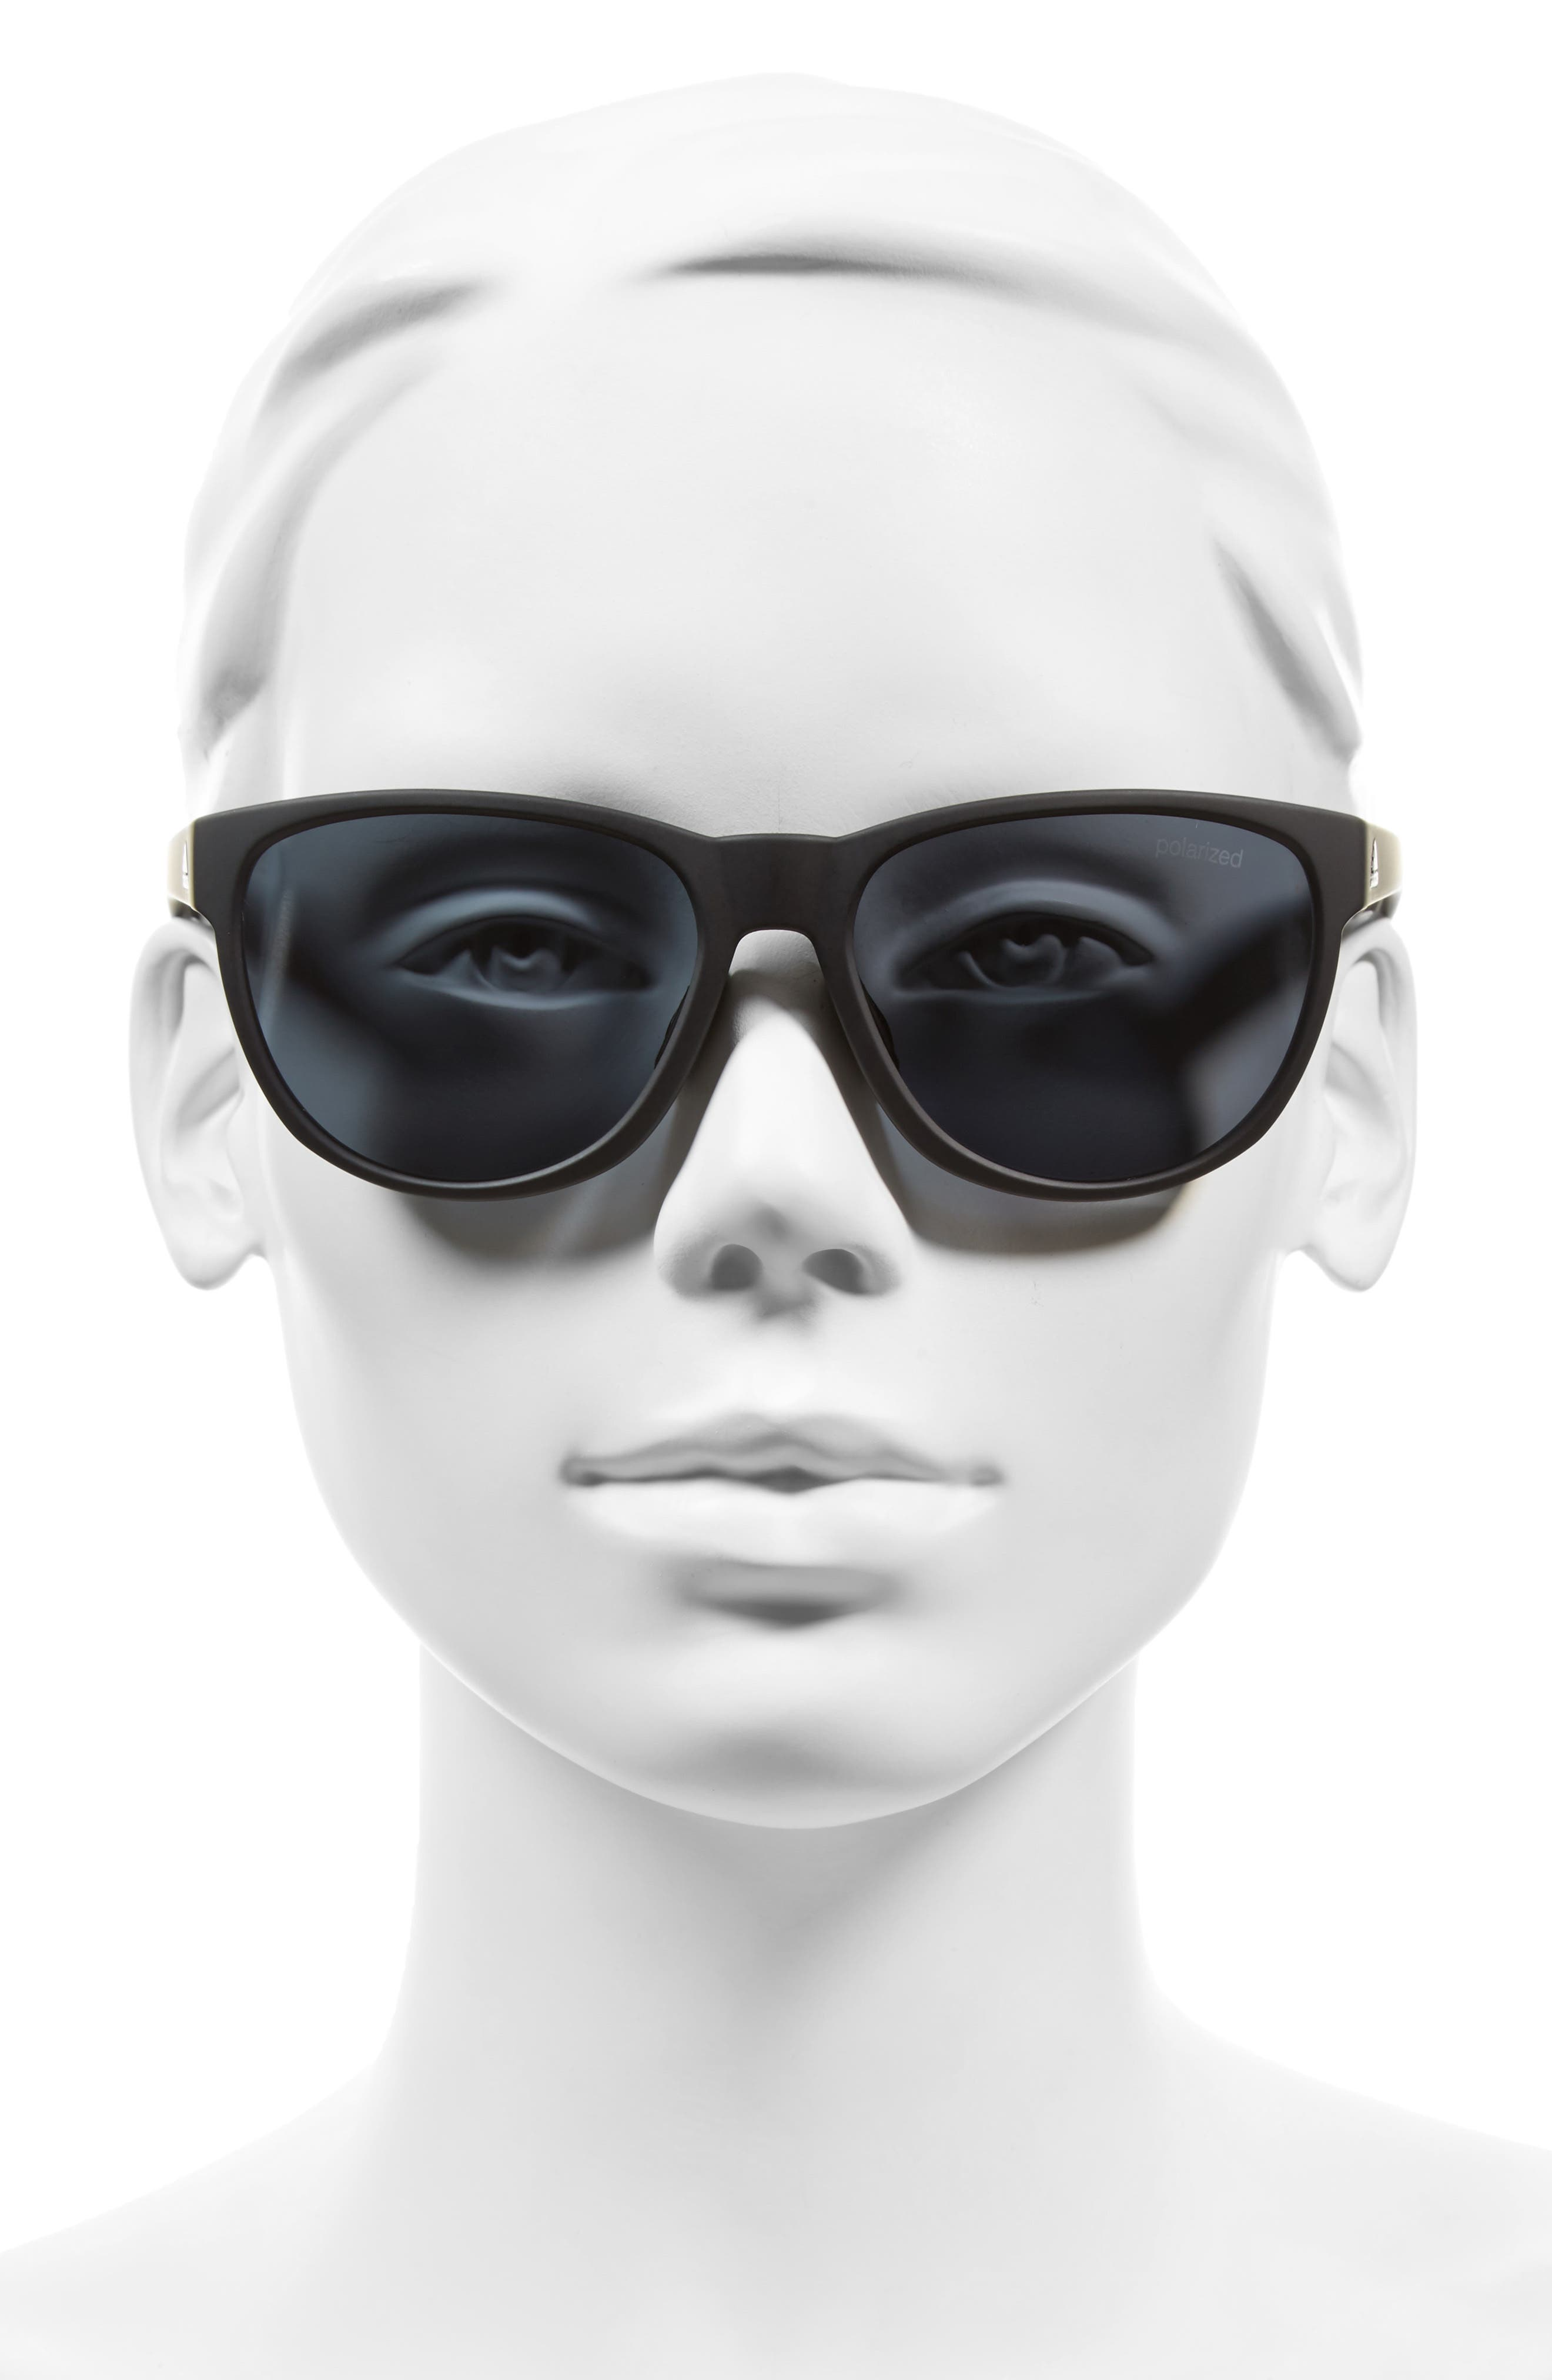 Wildcharge 61mm Polarized Sunglasses,                             Alternate thumbnail 2, color,                             001